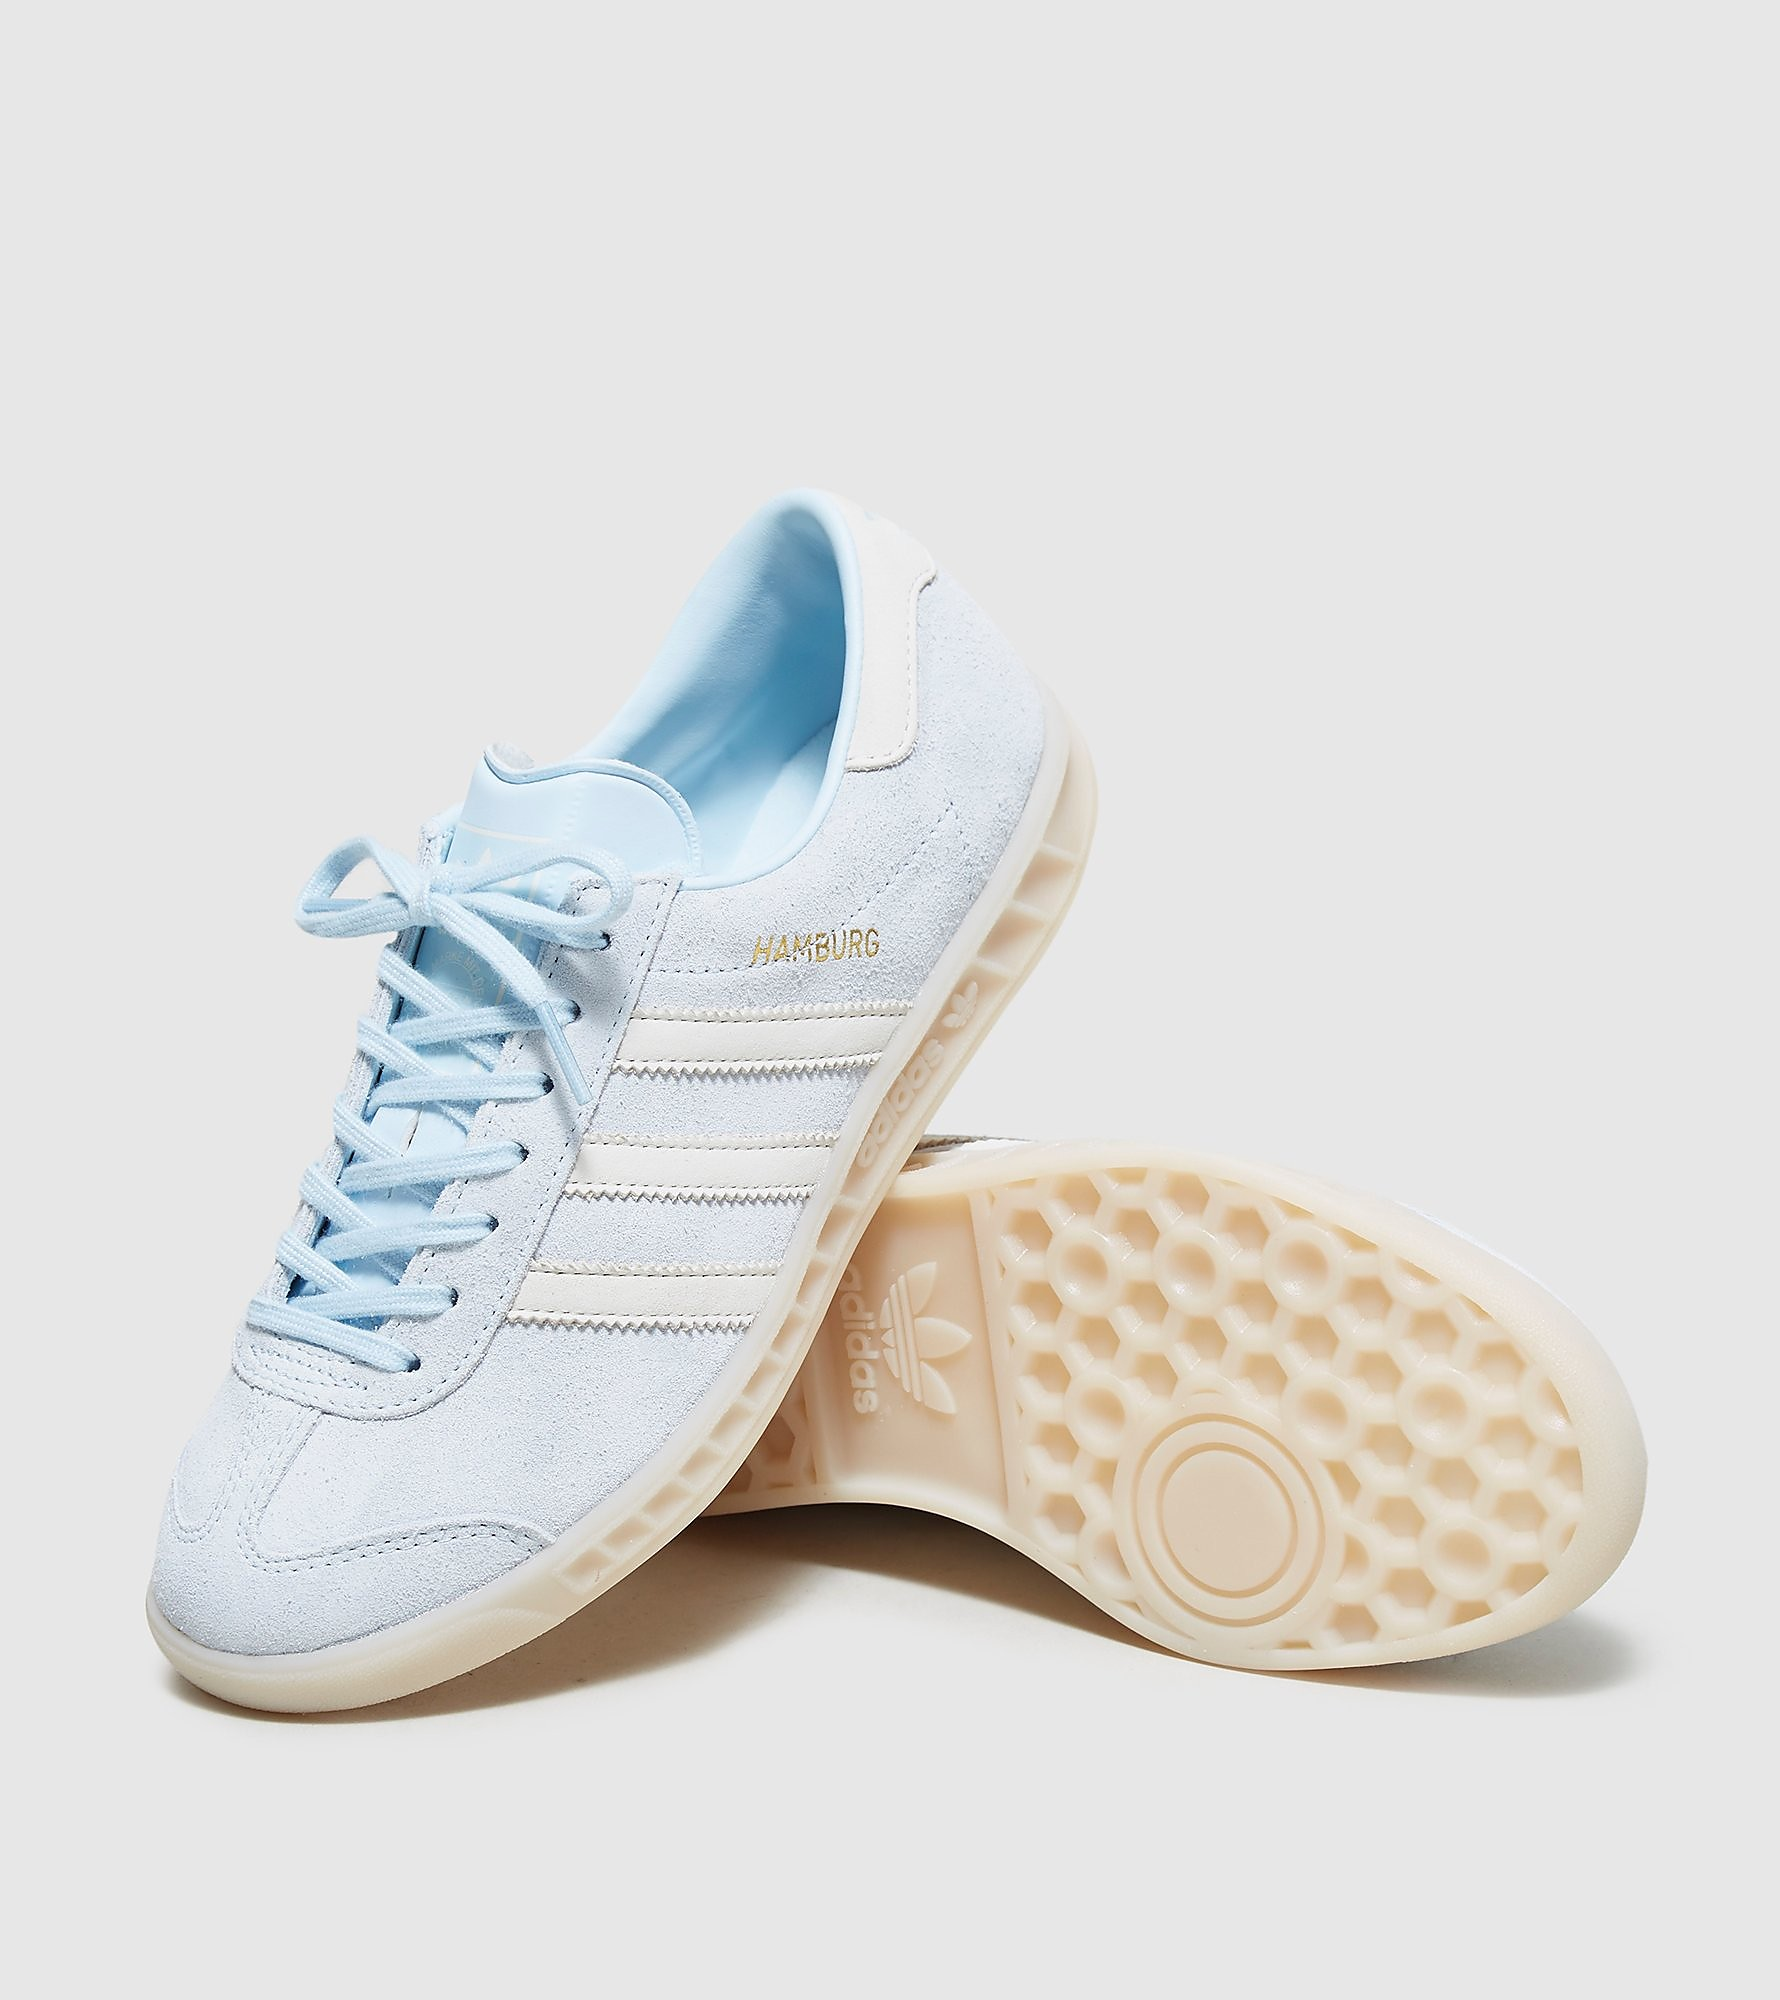 adidas Originals Hamburg 'Ice' Womens